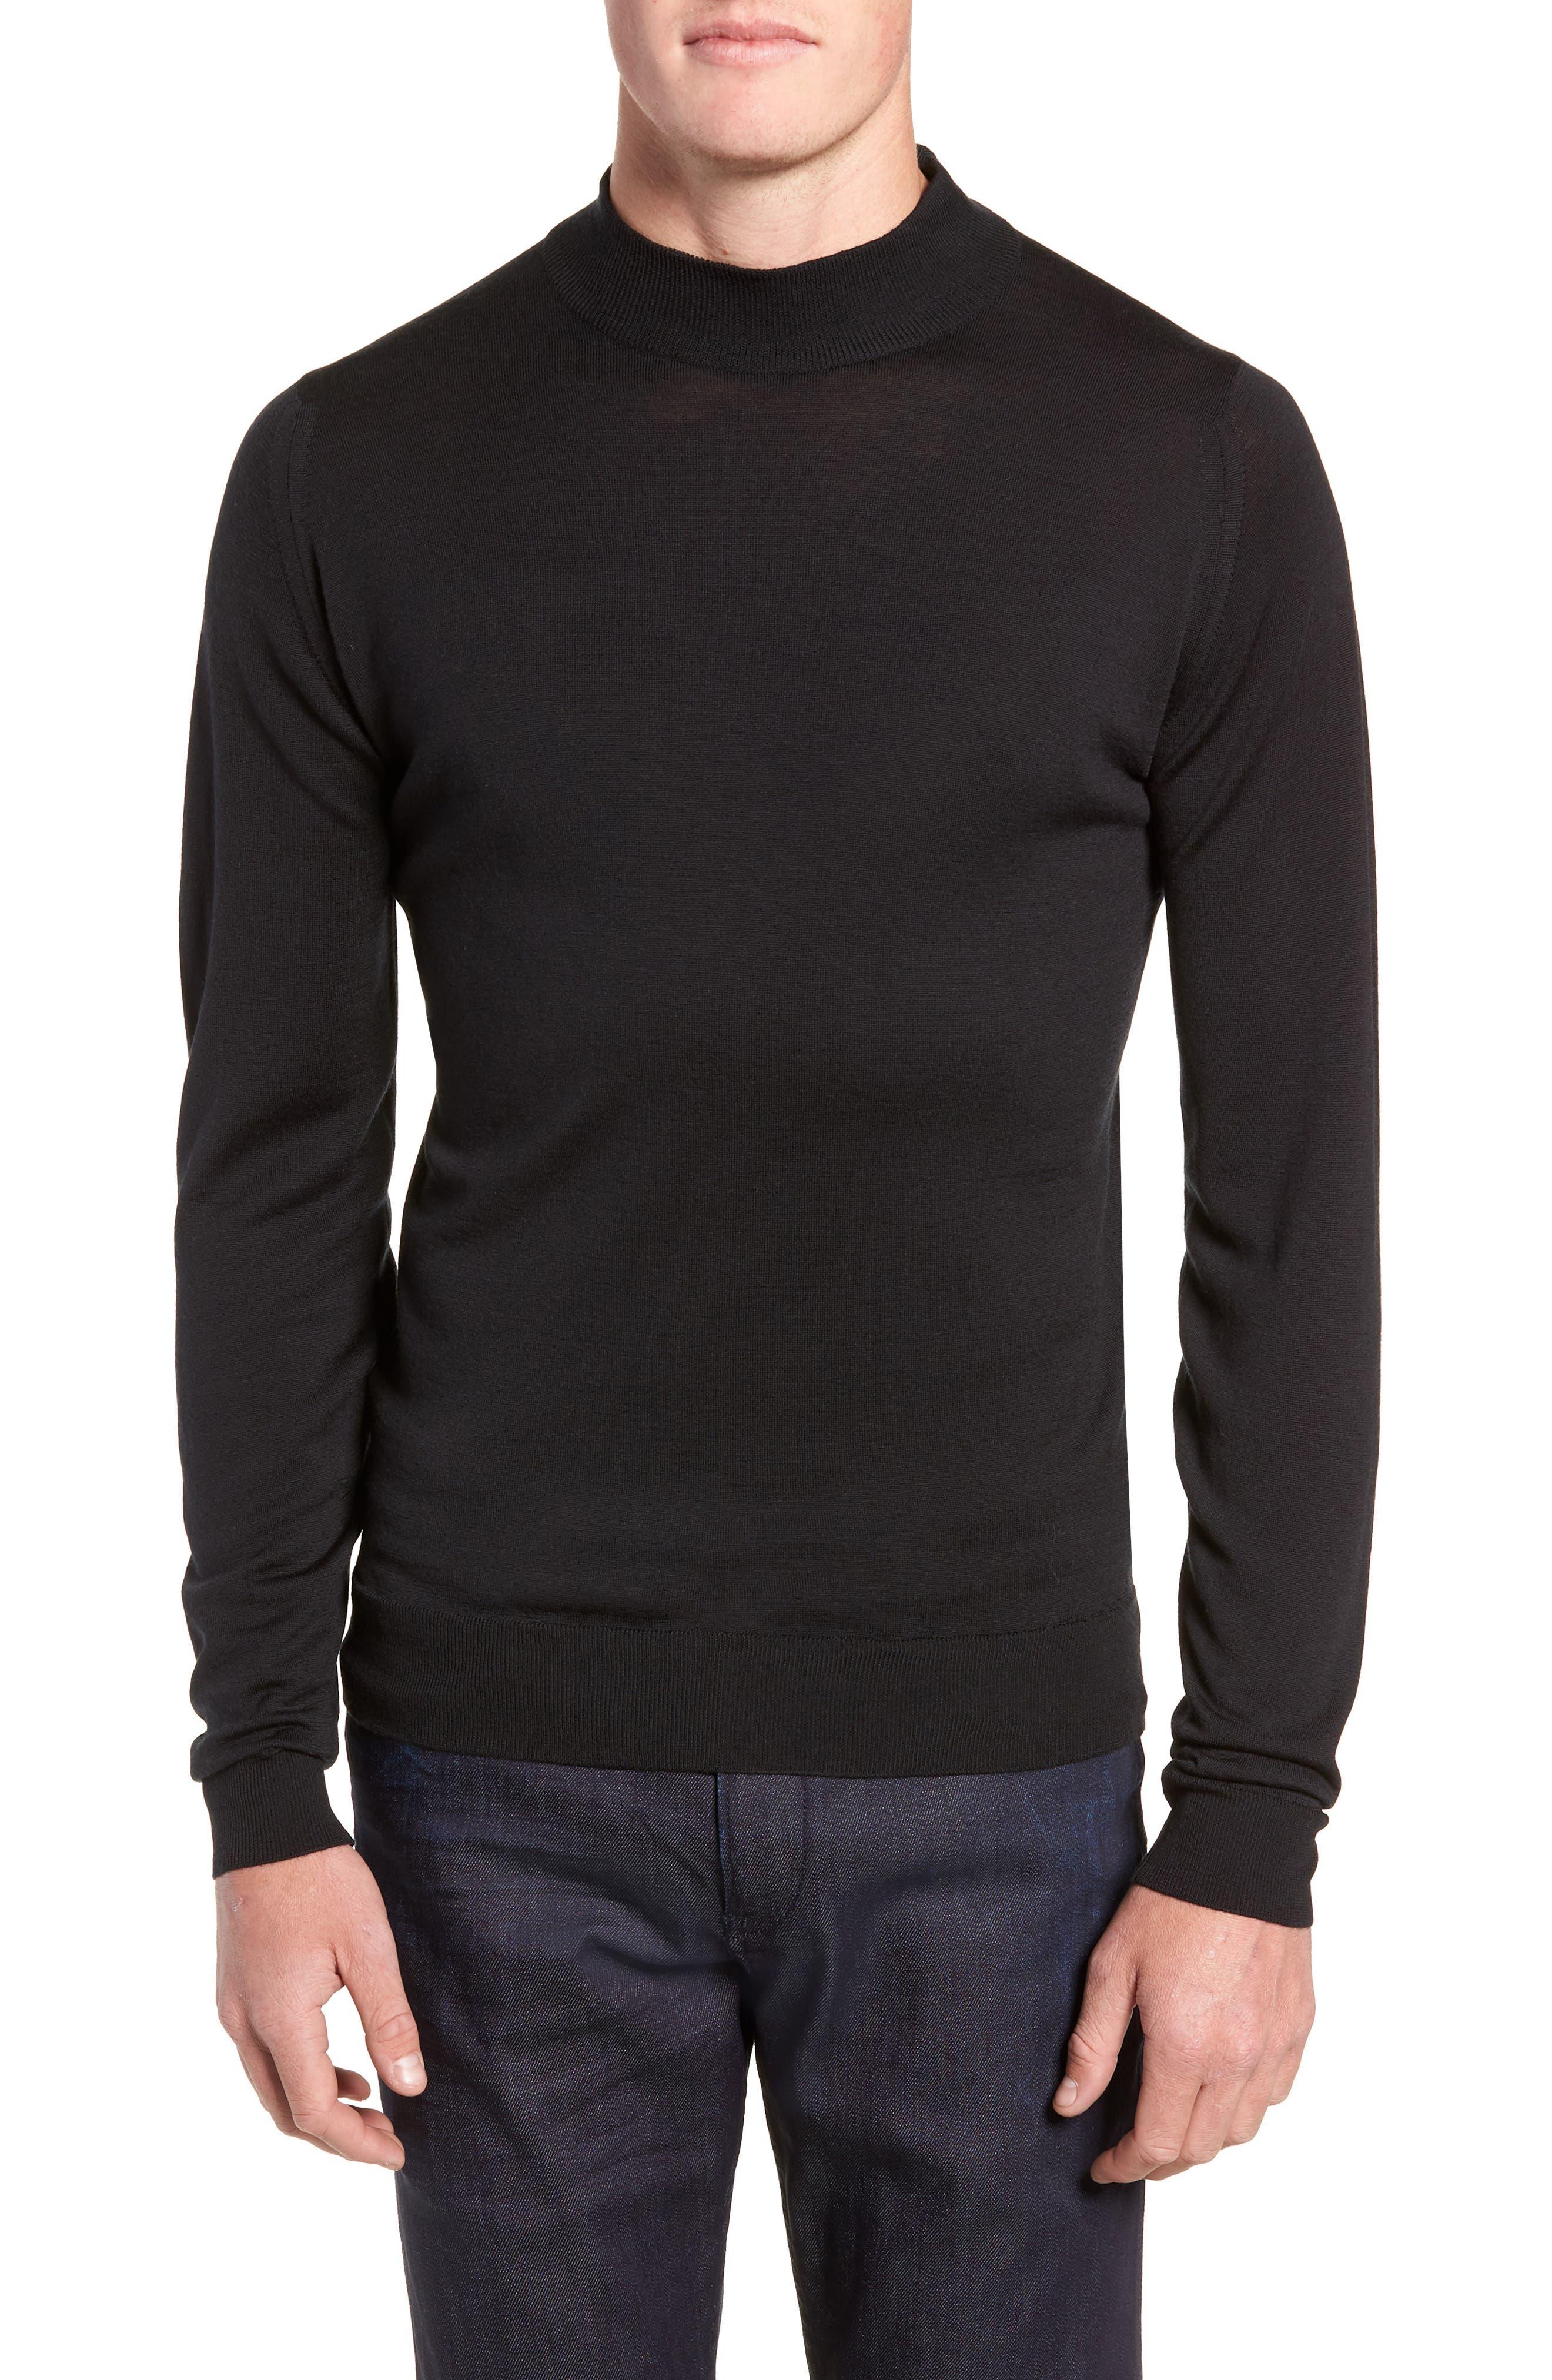 John Smedley Slim Fit Mock Neck Merino Wool Sweater, Black